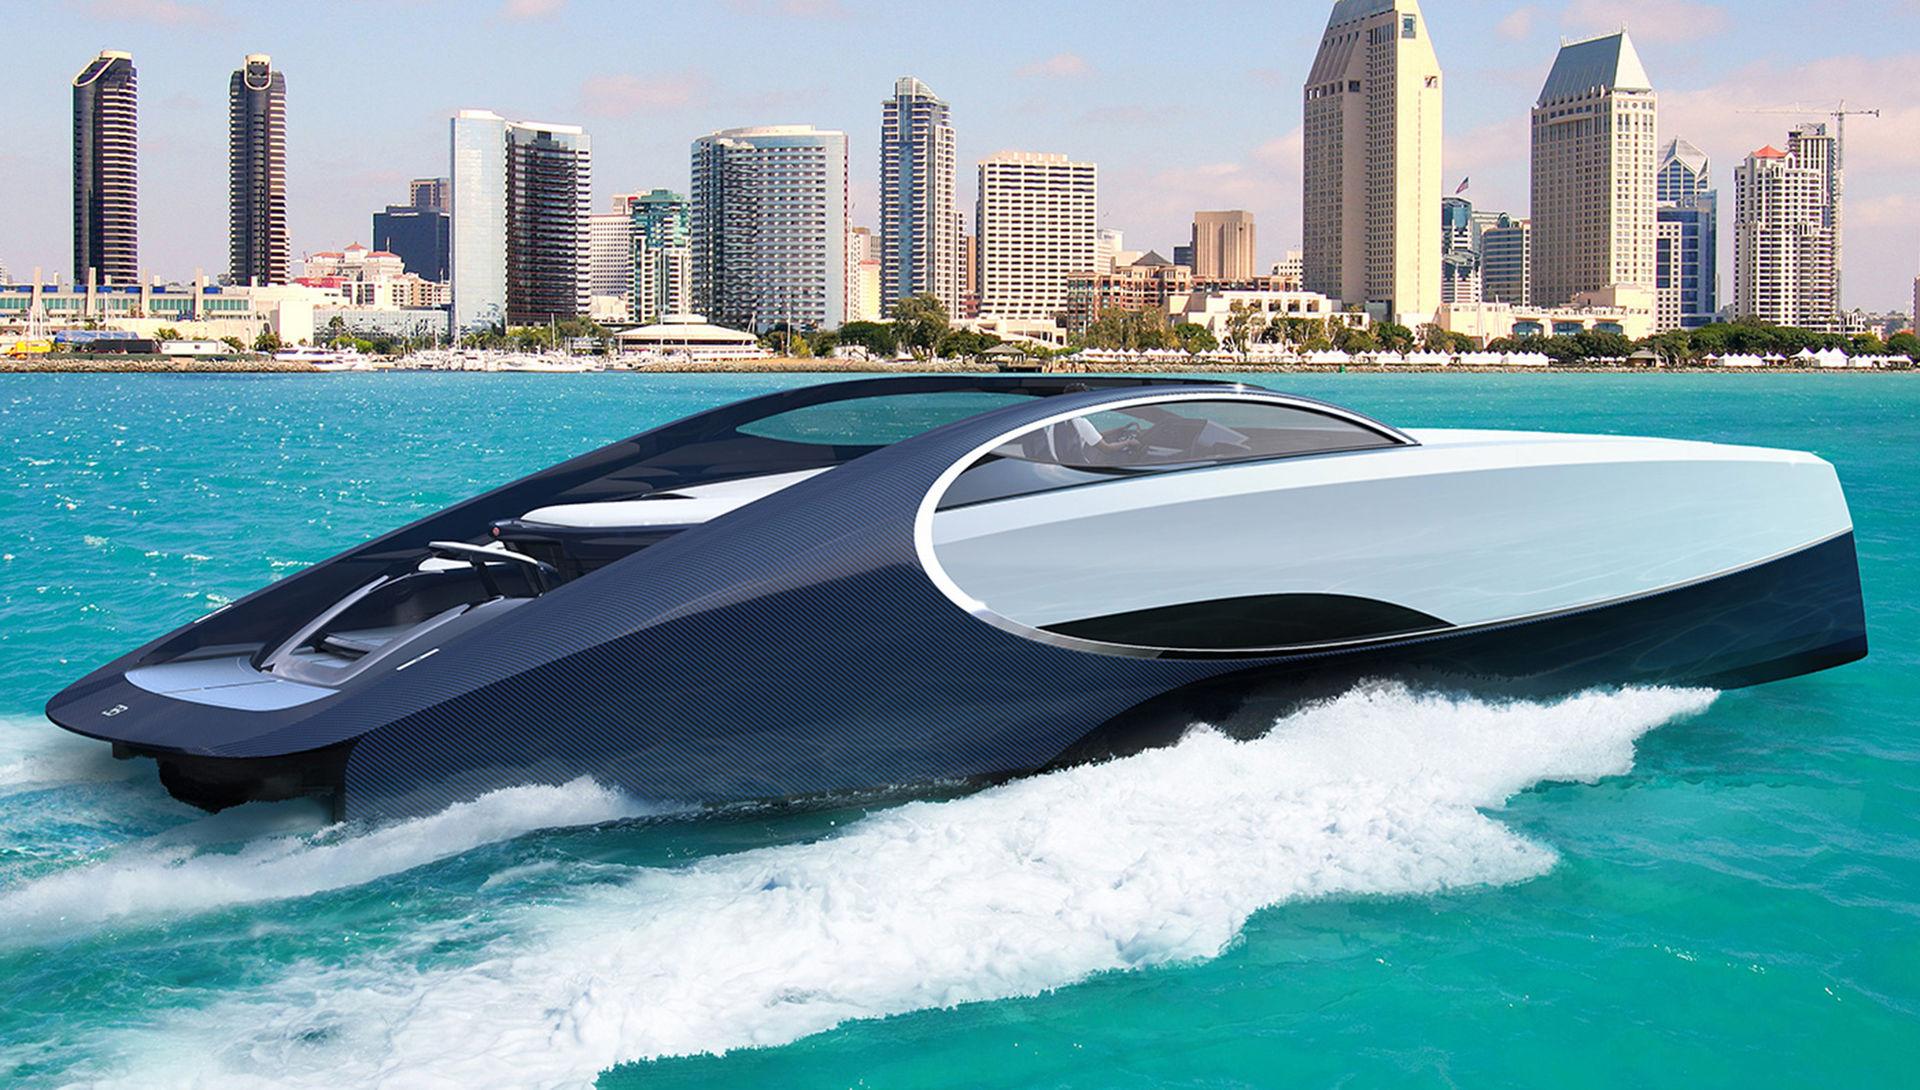 Ny båt från Bugatti